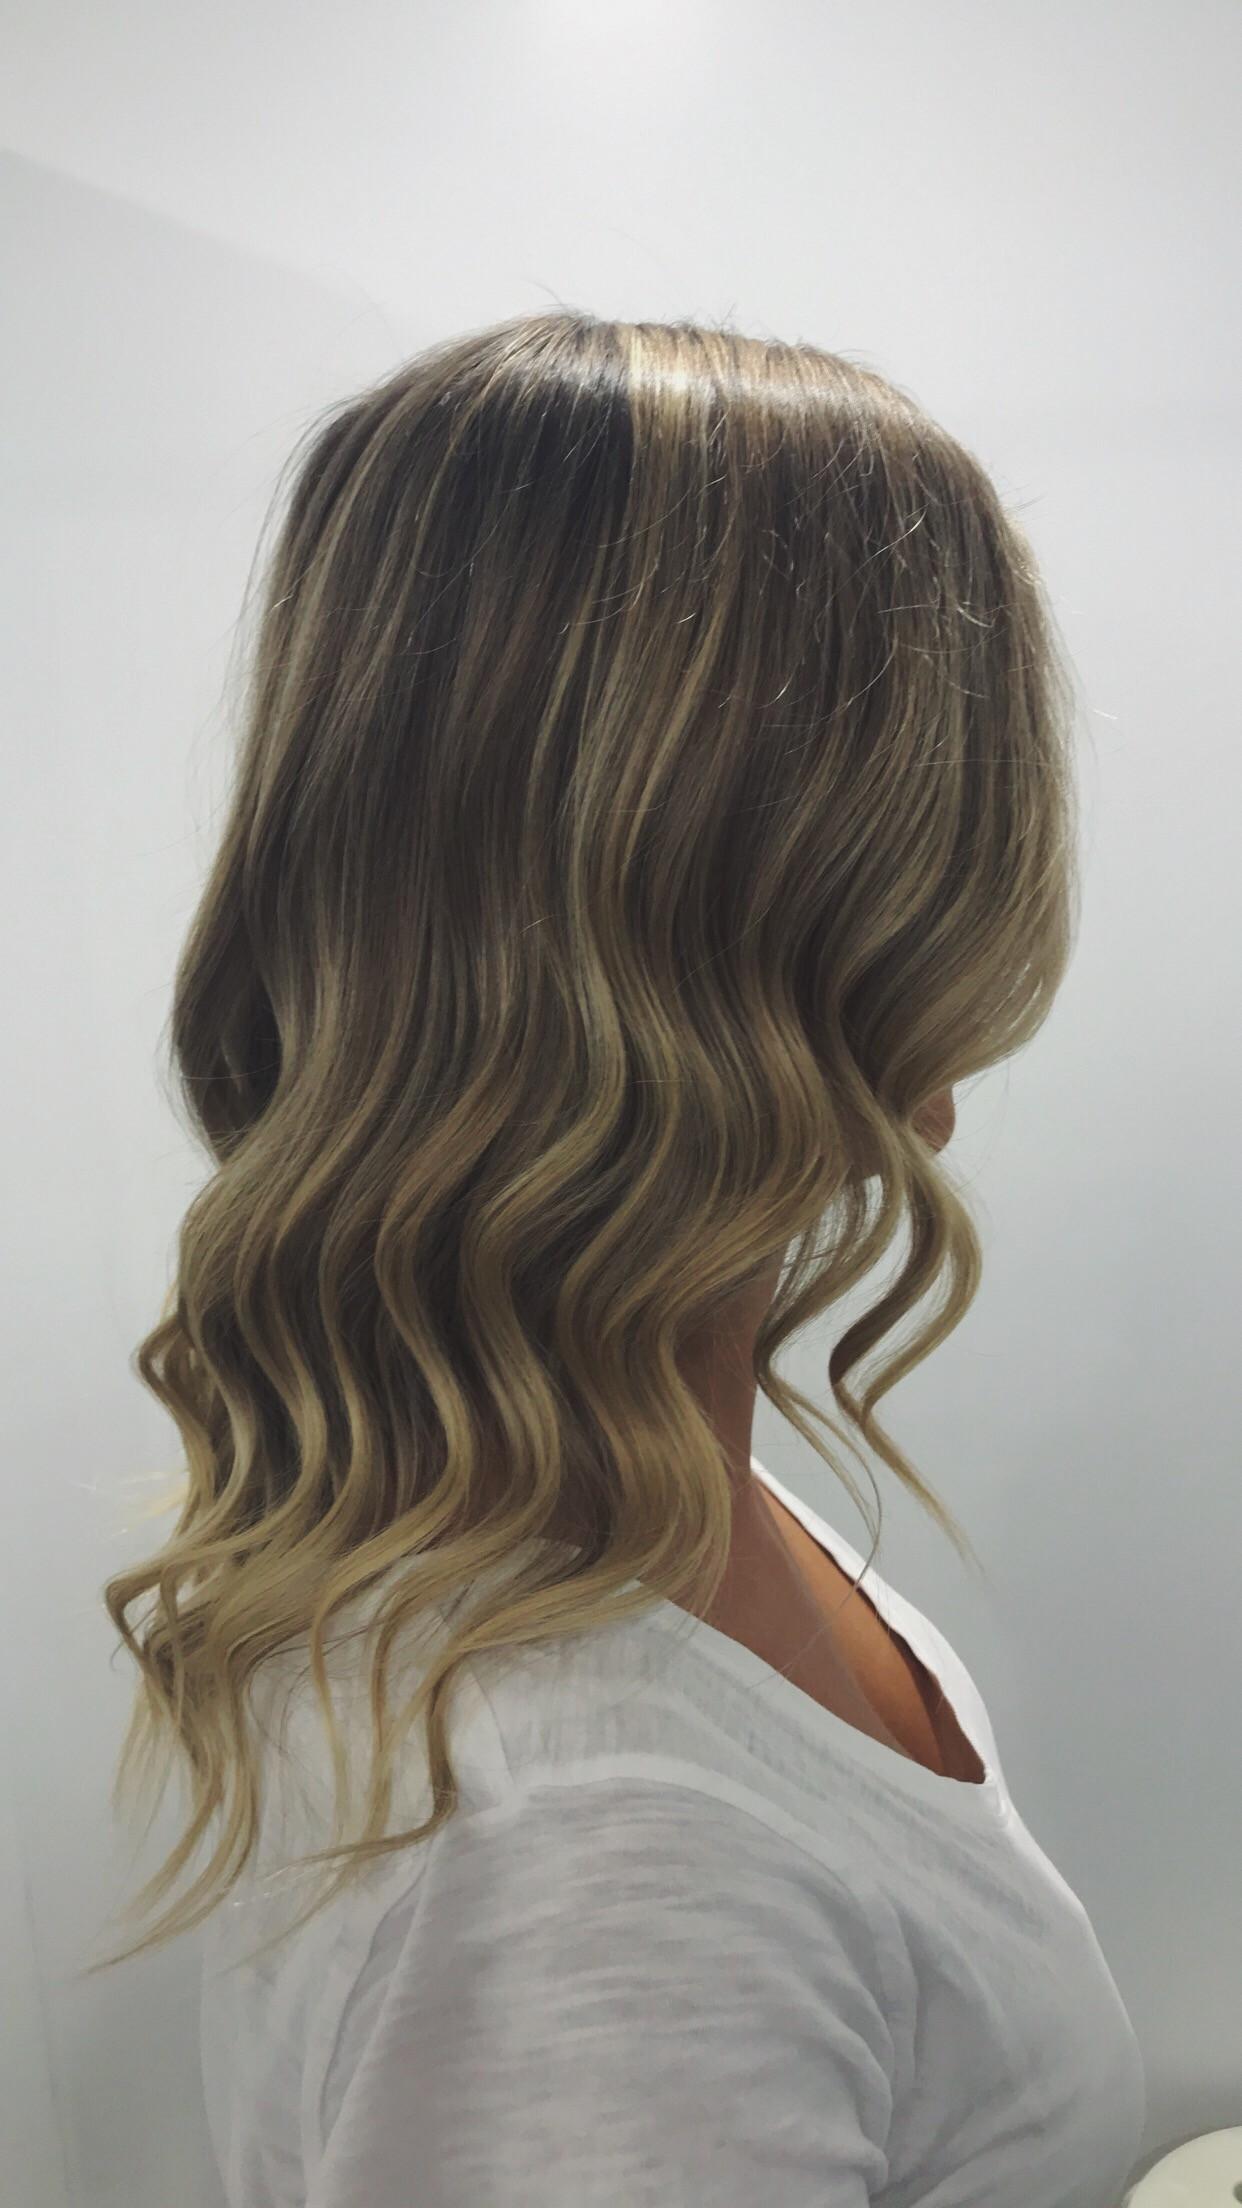 Short/Medium Hair Styling Down Style